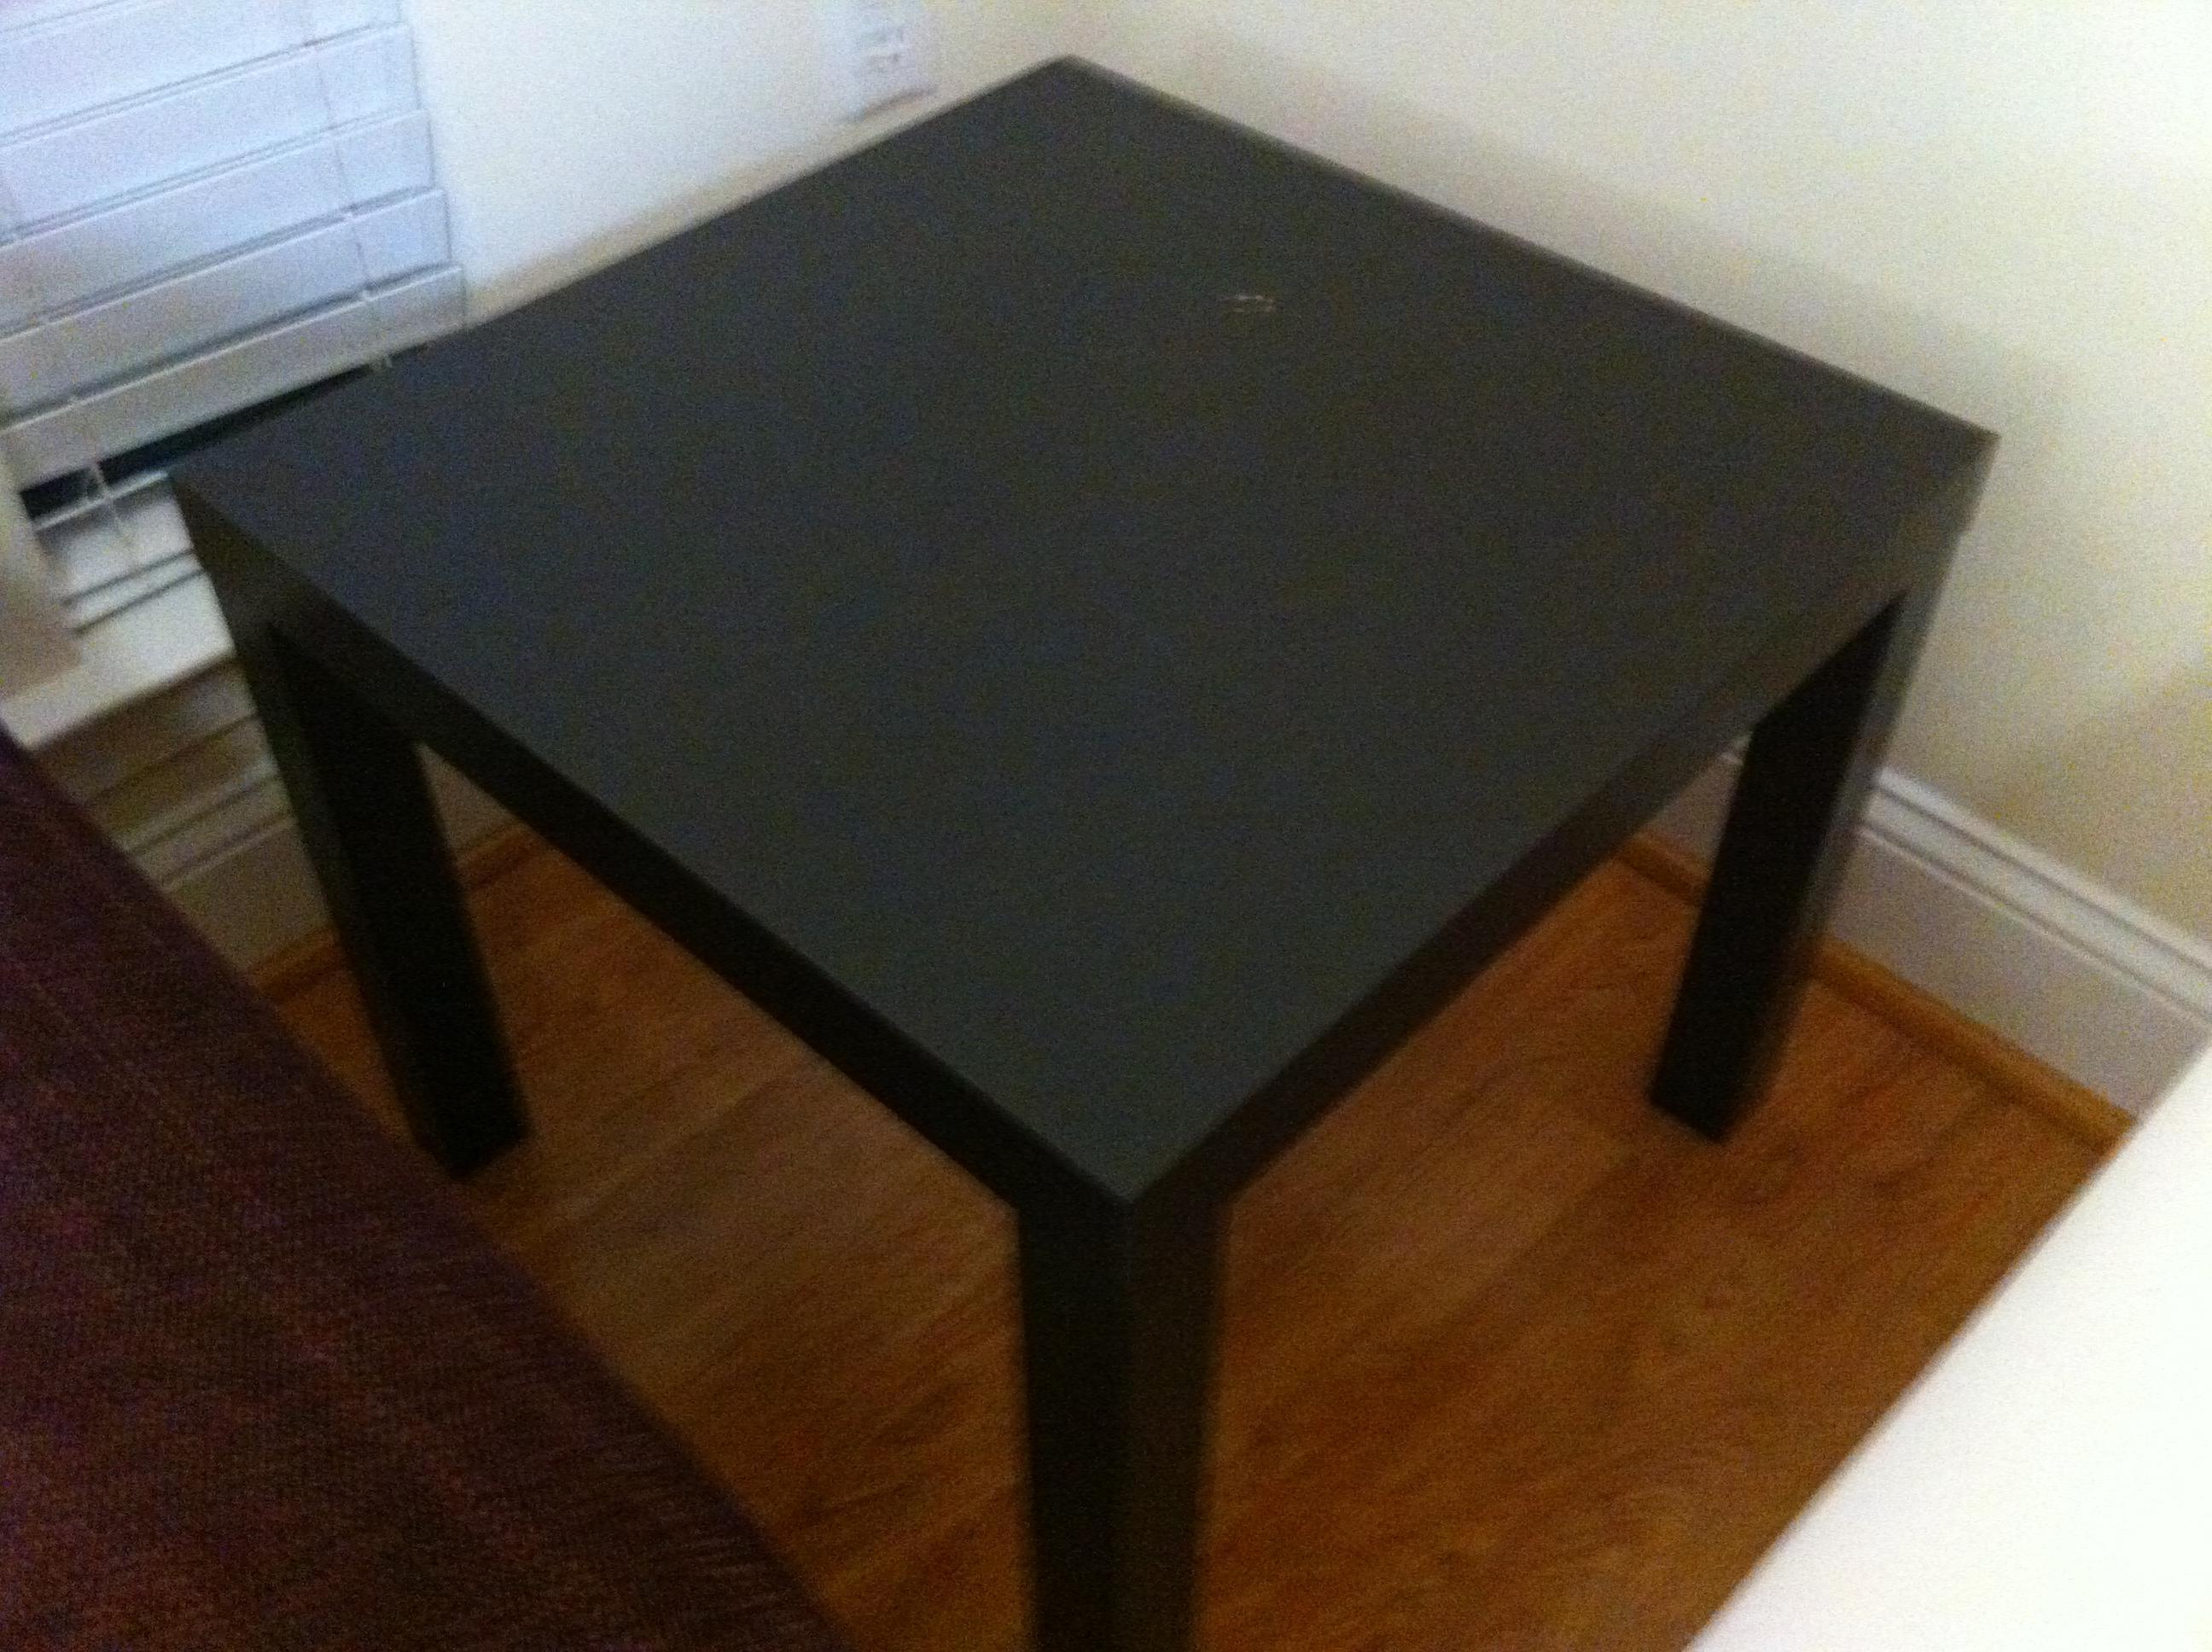 ���� ��� ������ ���� ����  ��������:Lack side table.JPG ���������:8 ��������:598.5 �������� �����:26882